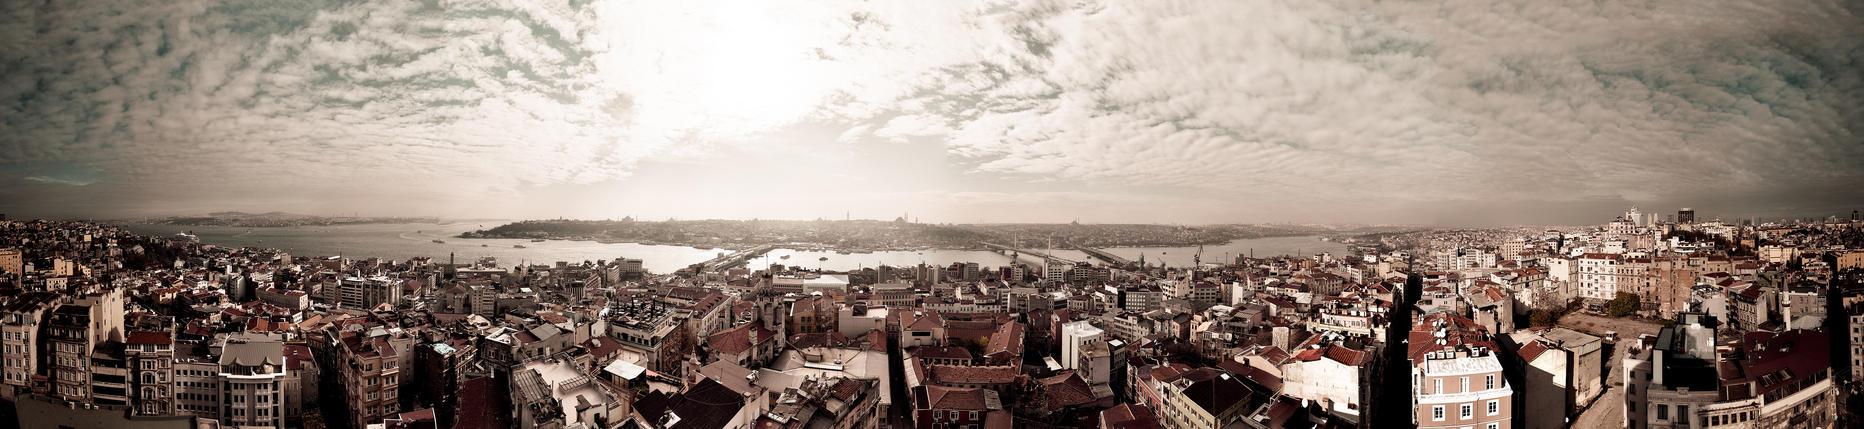 Panorama from Galata Tower, Istambul, Turkey. by w3rw01f